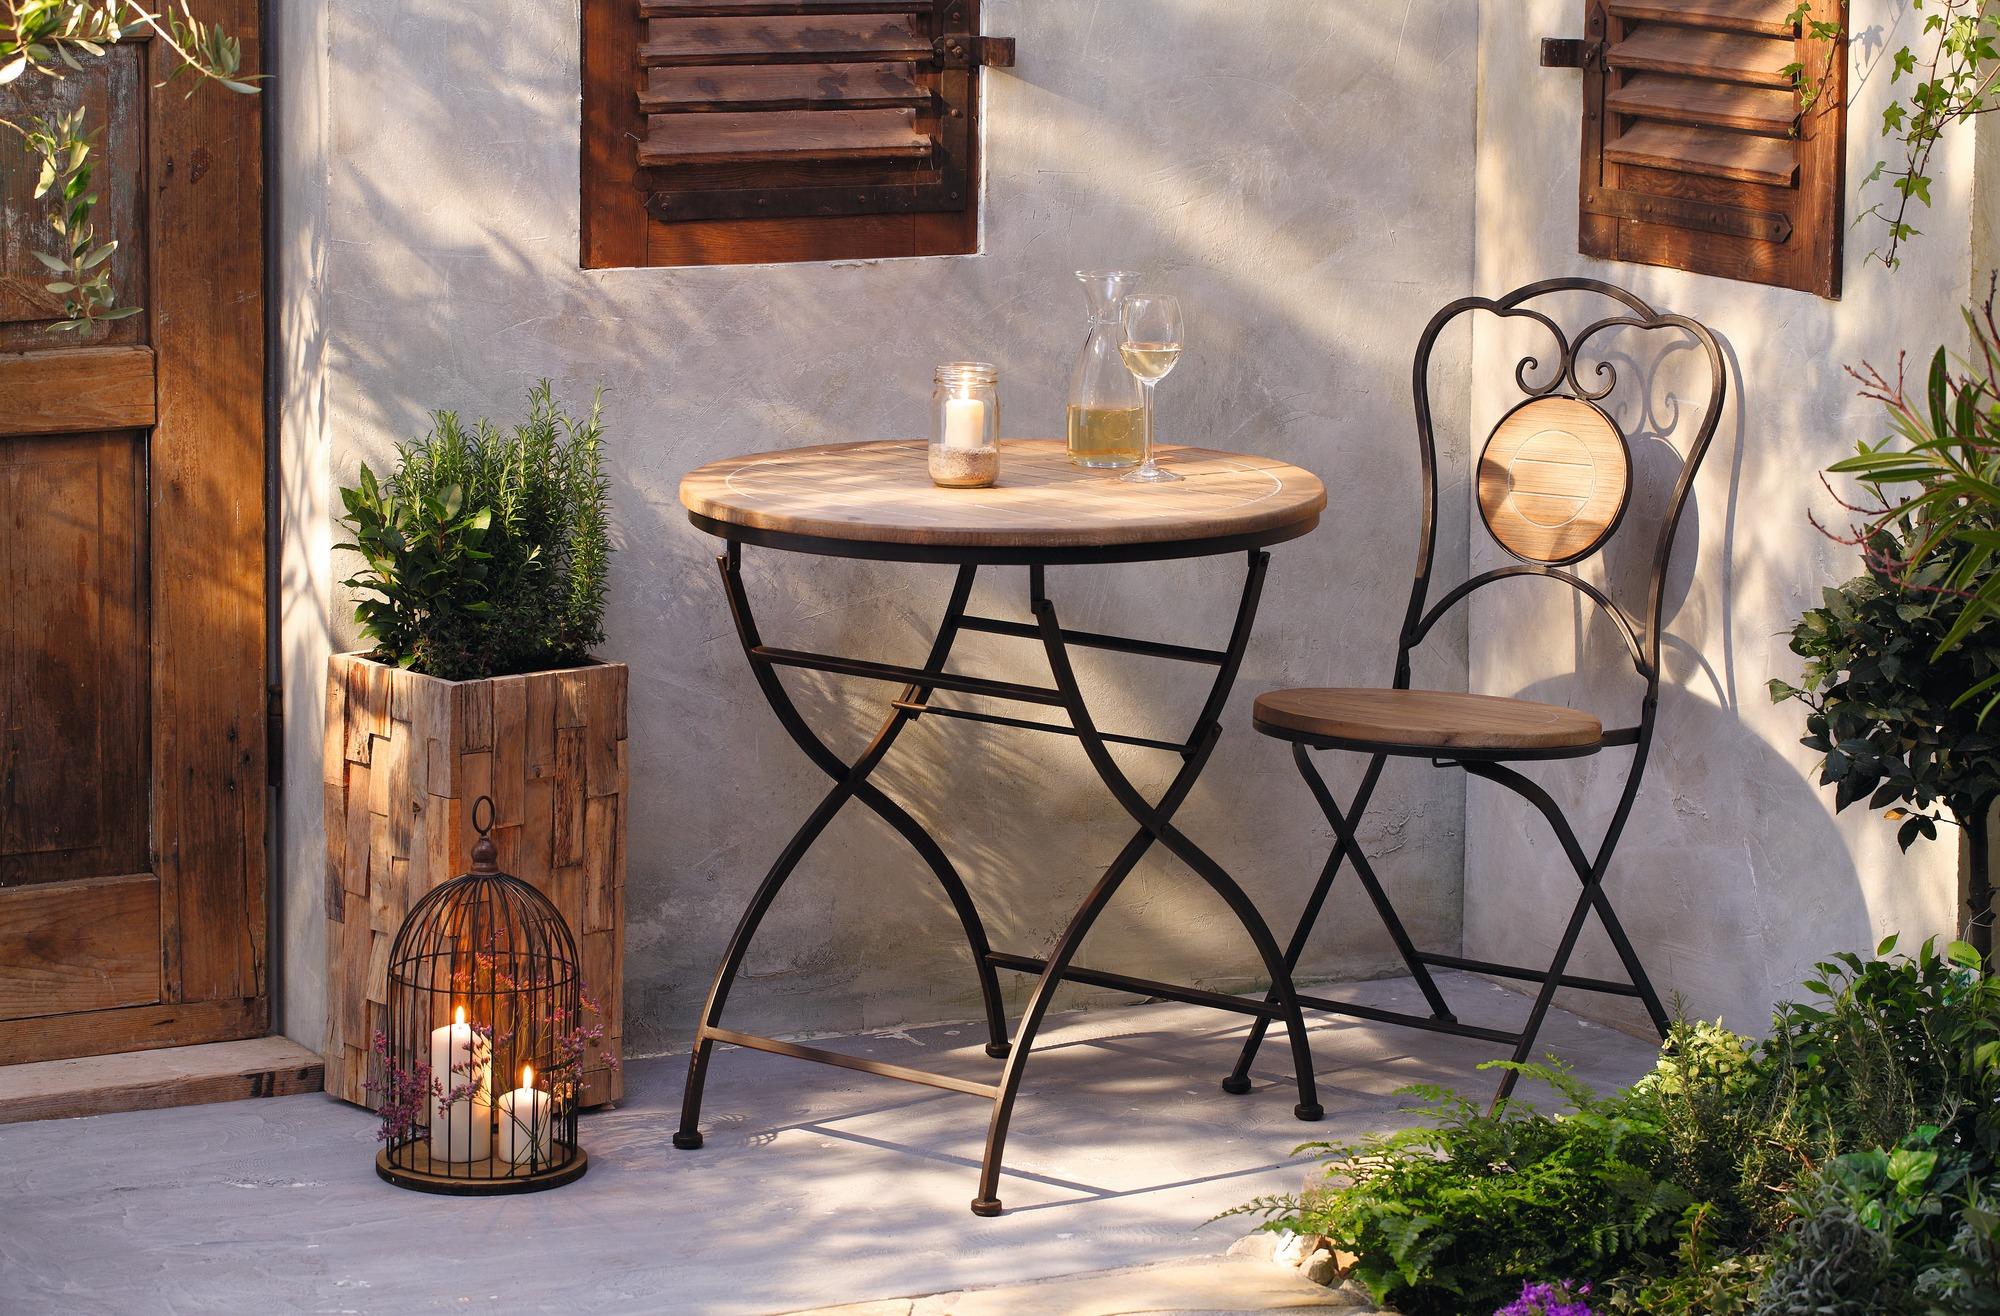 Klappstuhl holz antik  Garten Tisch aus Metall & Holz, Antik Design, Balkon Terrasse Klapp ...